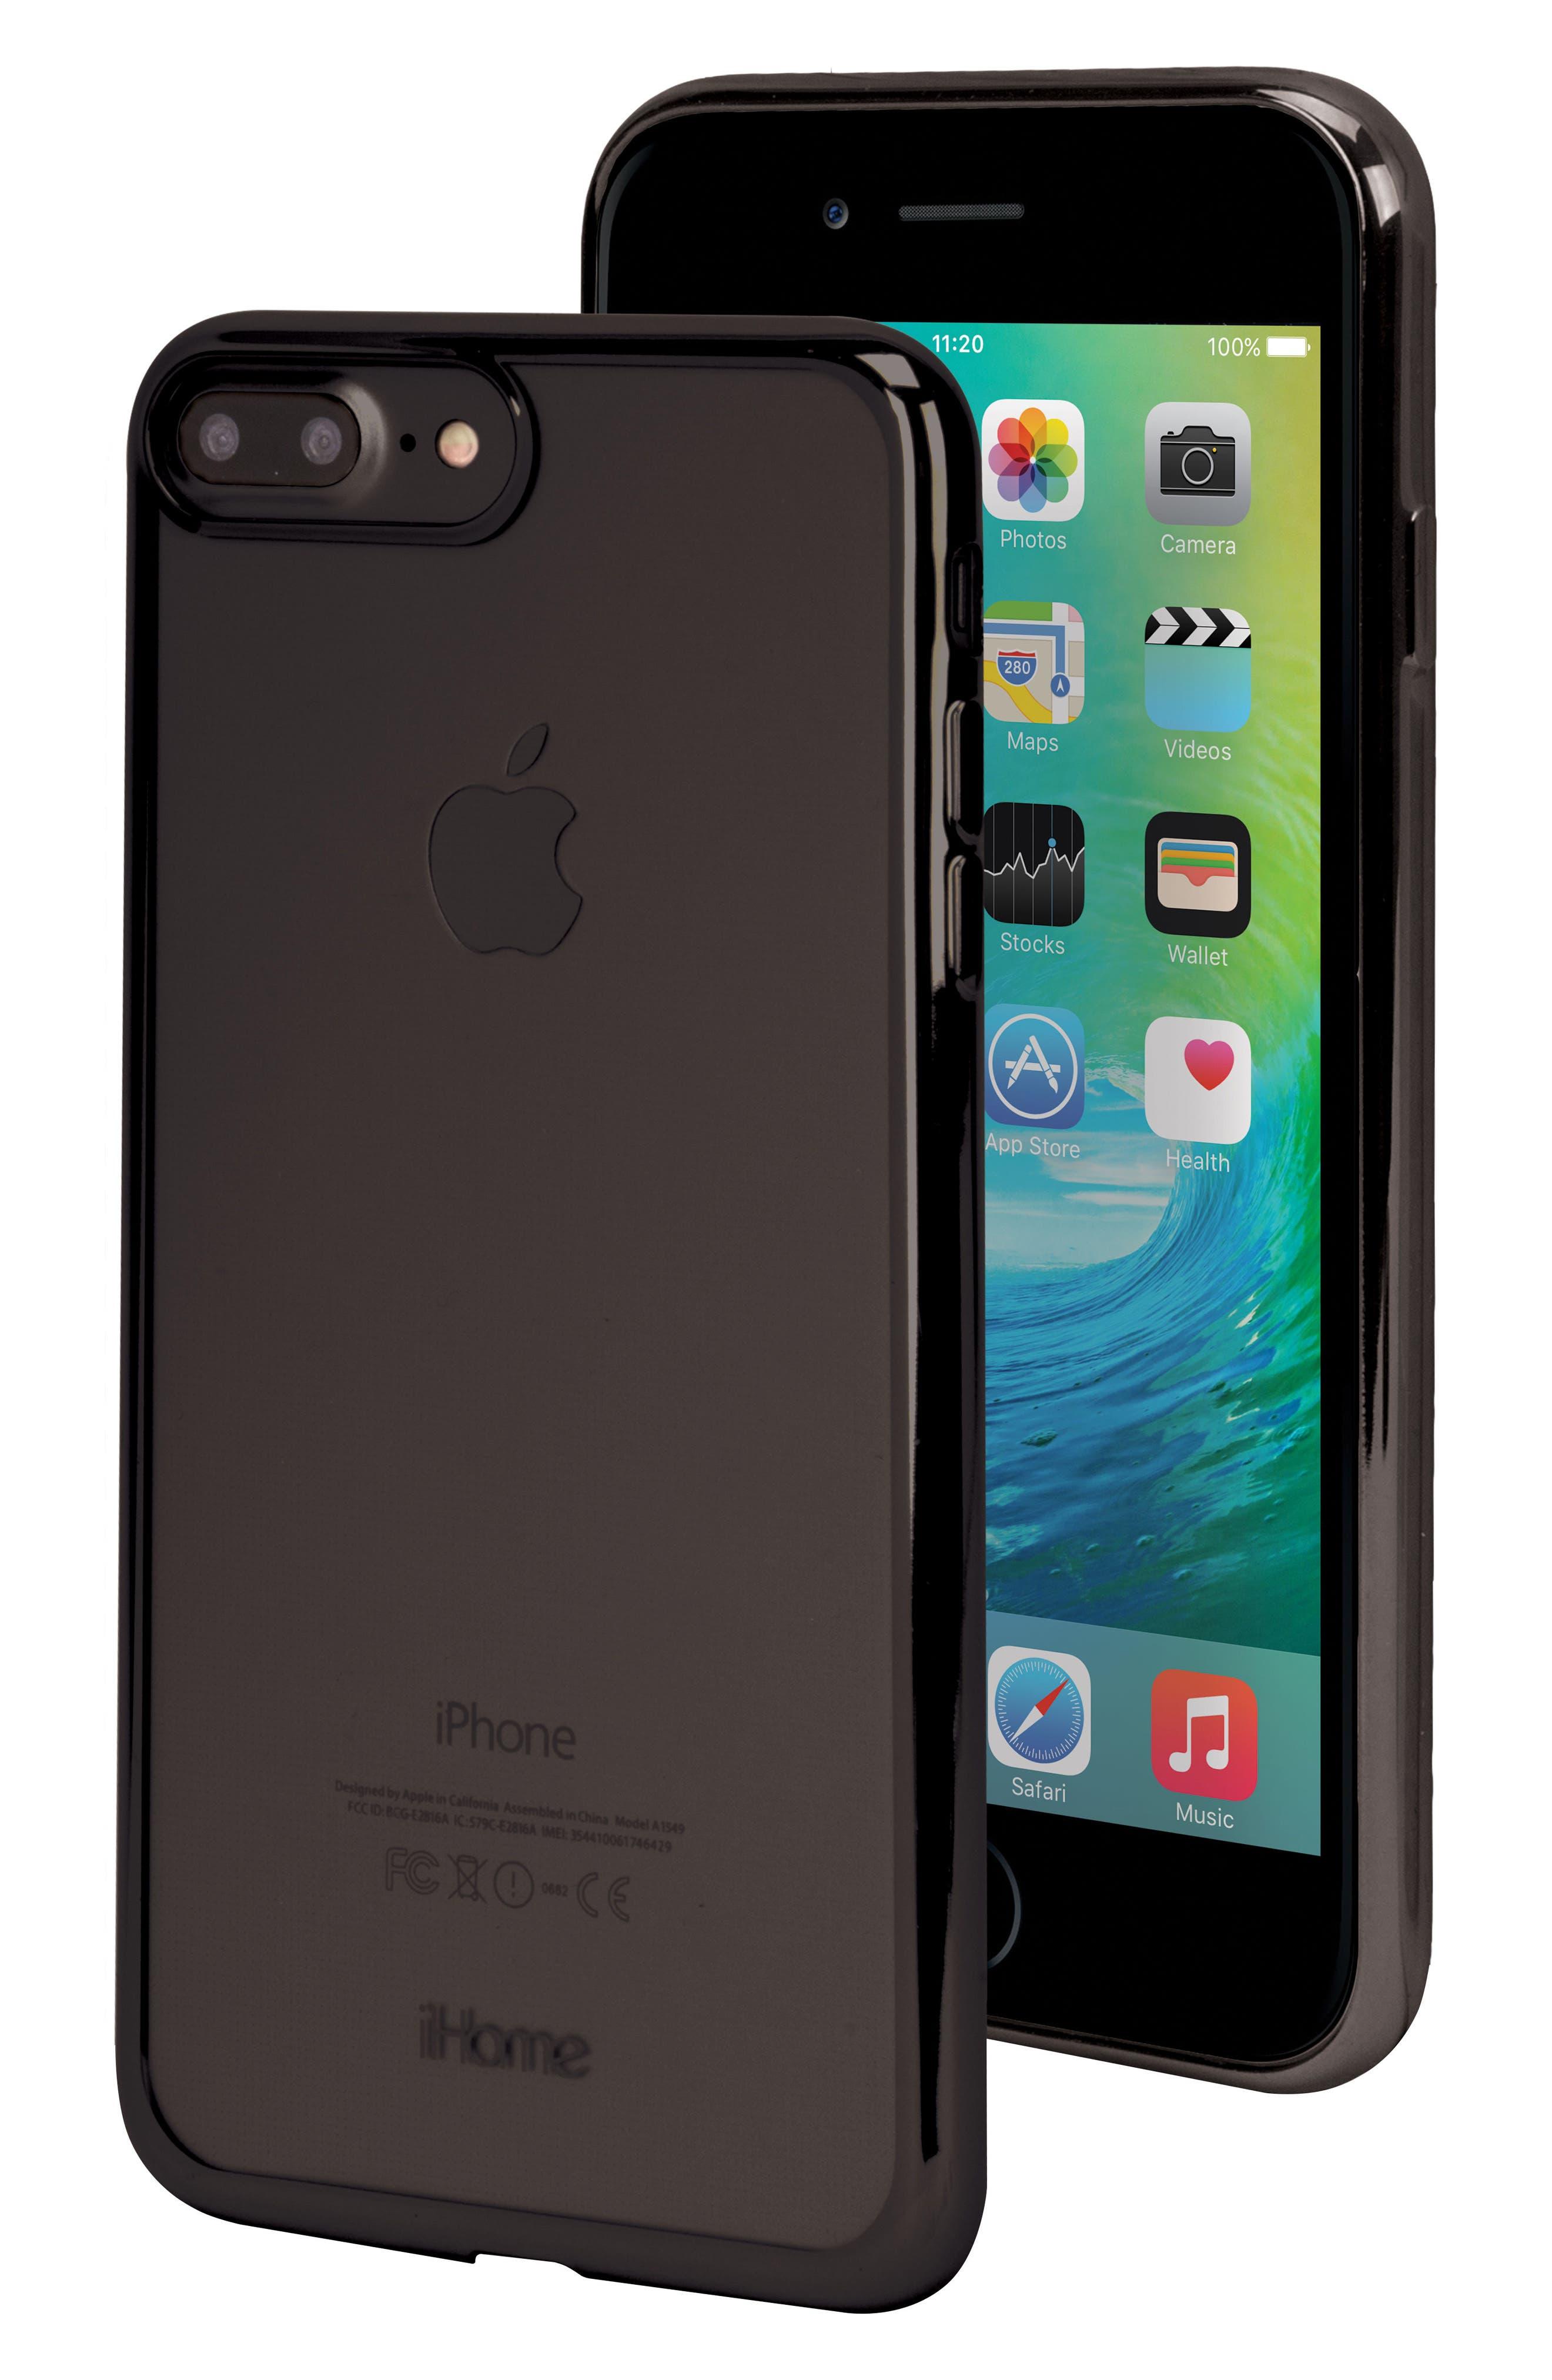 iHome Lux iPhone 6/7 Plus Case